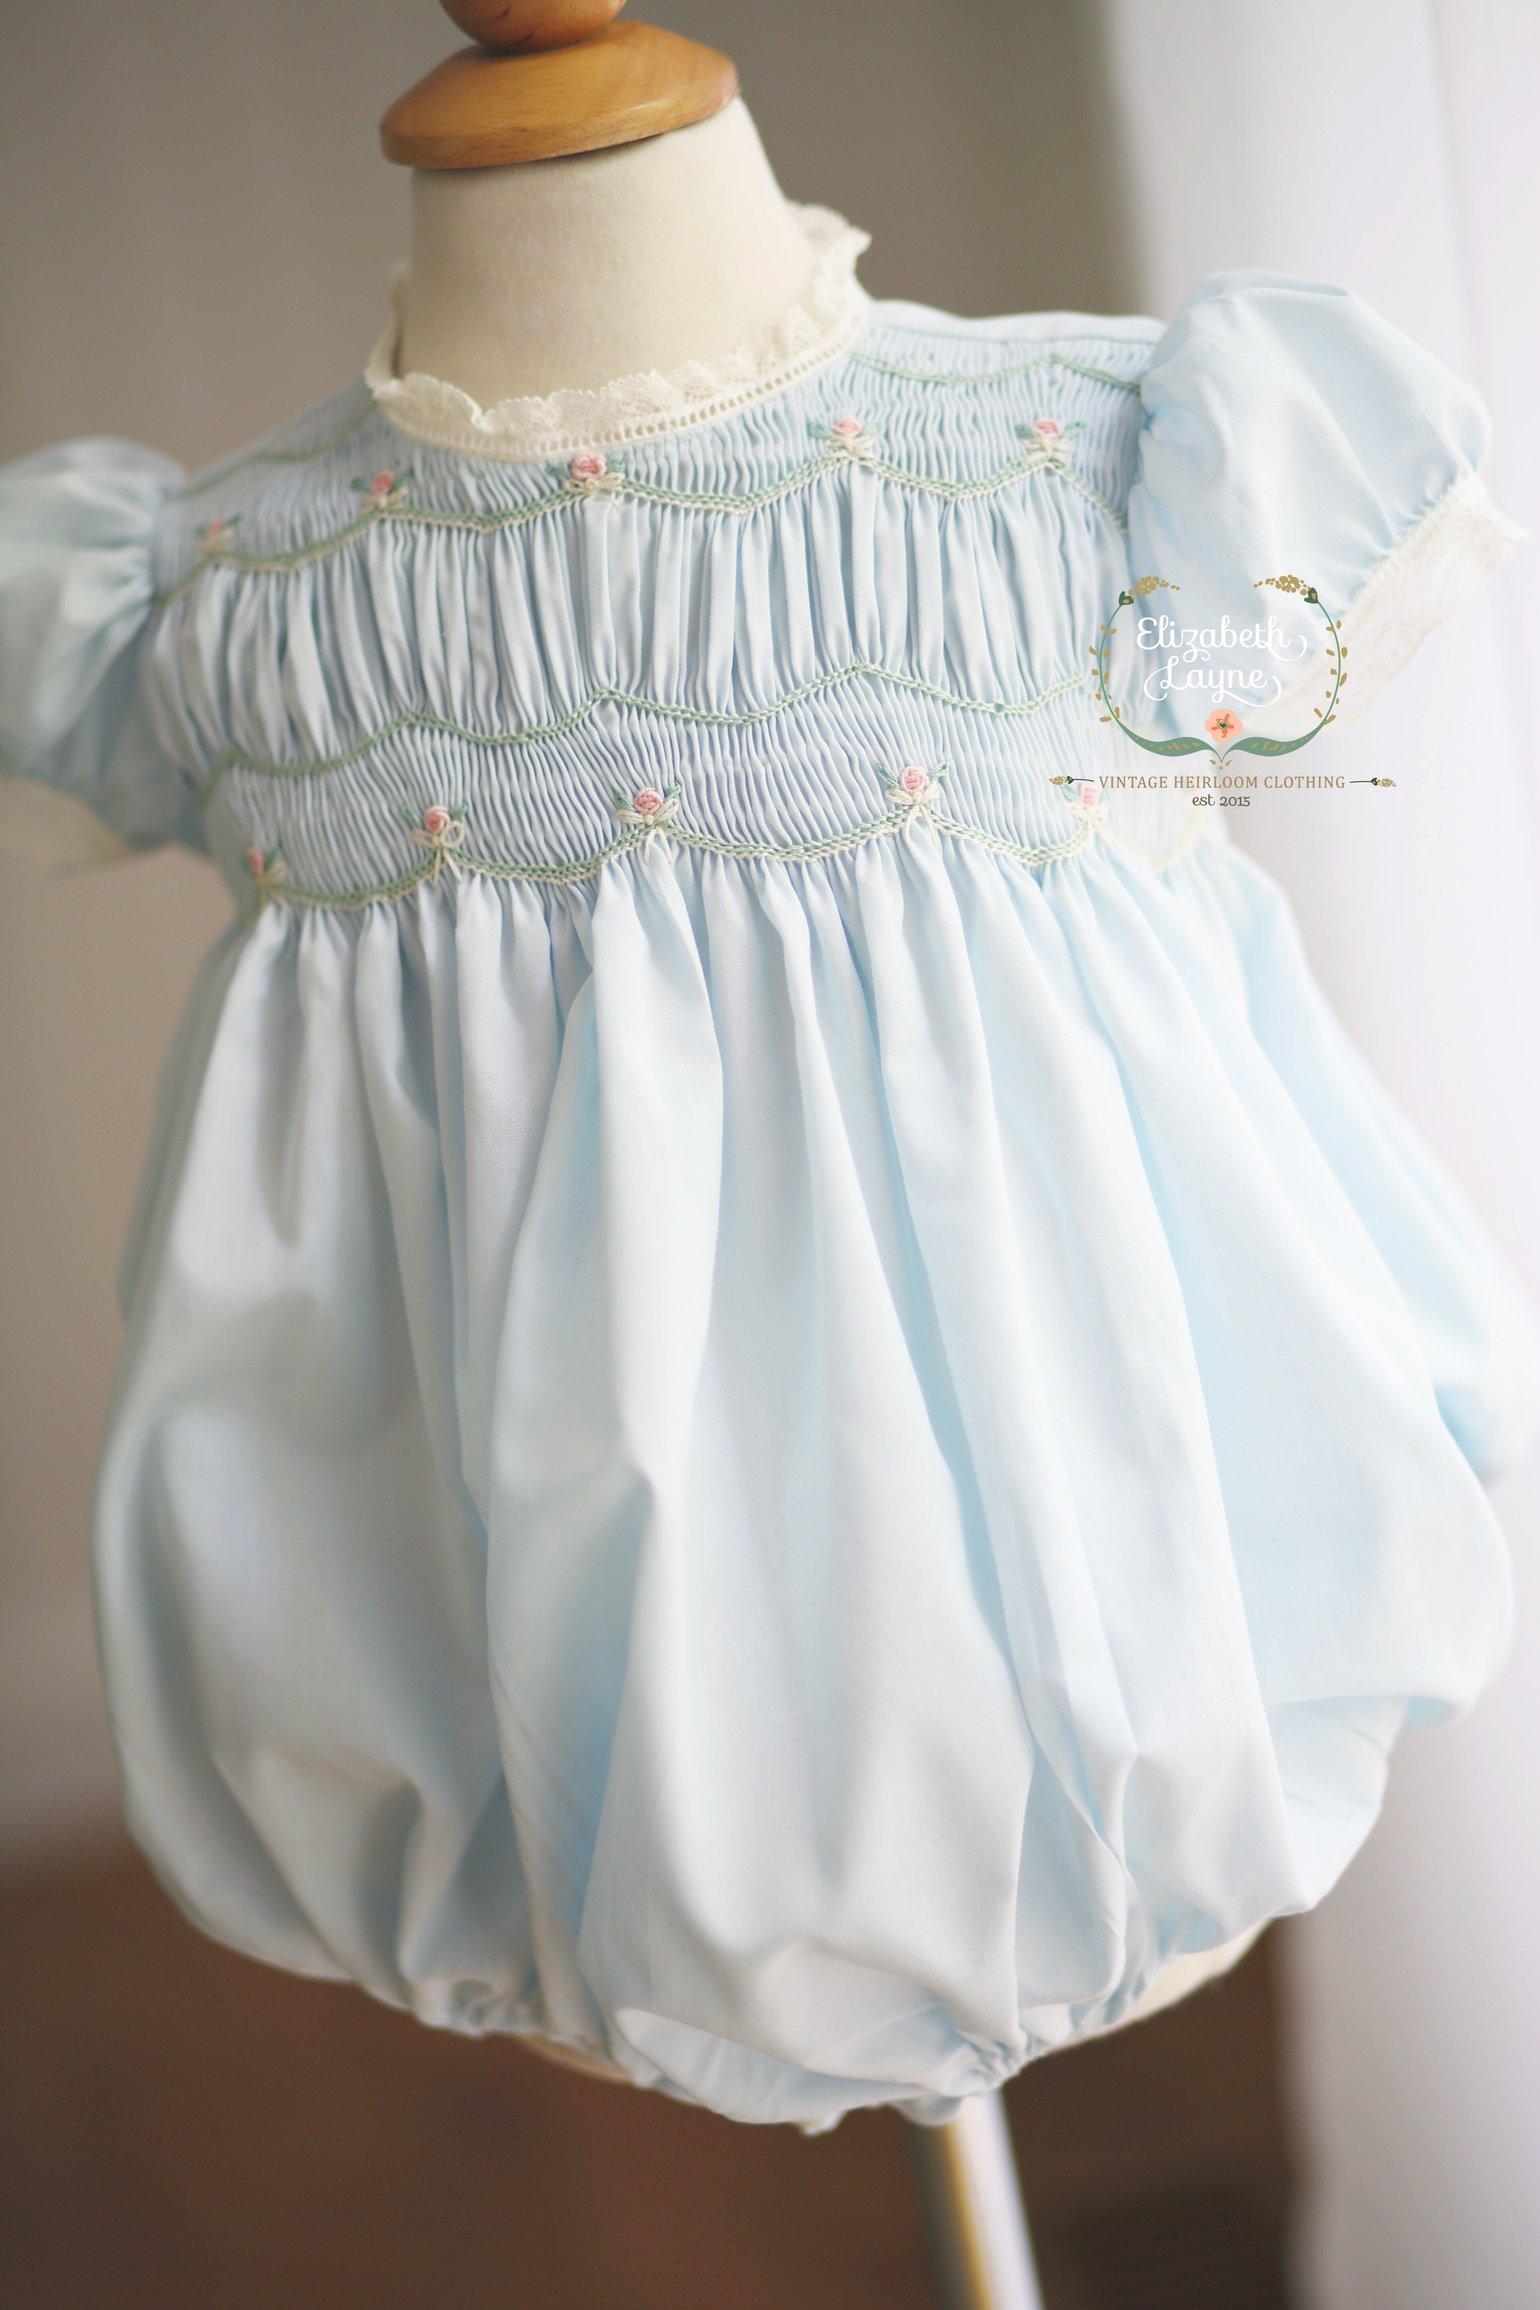 Image of Waverly Fairytale Bubble & Dress